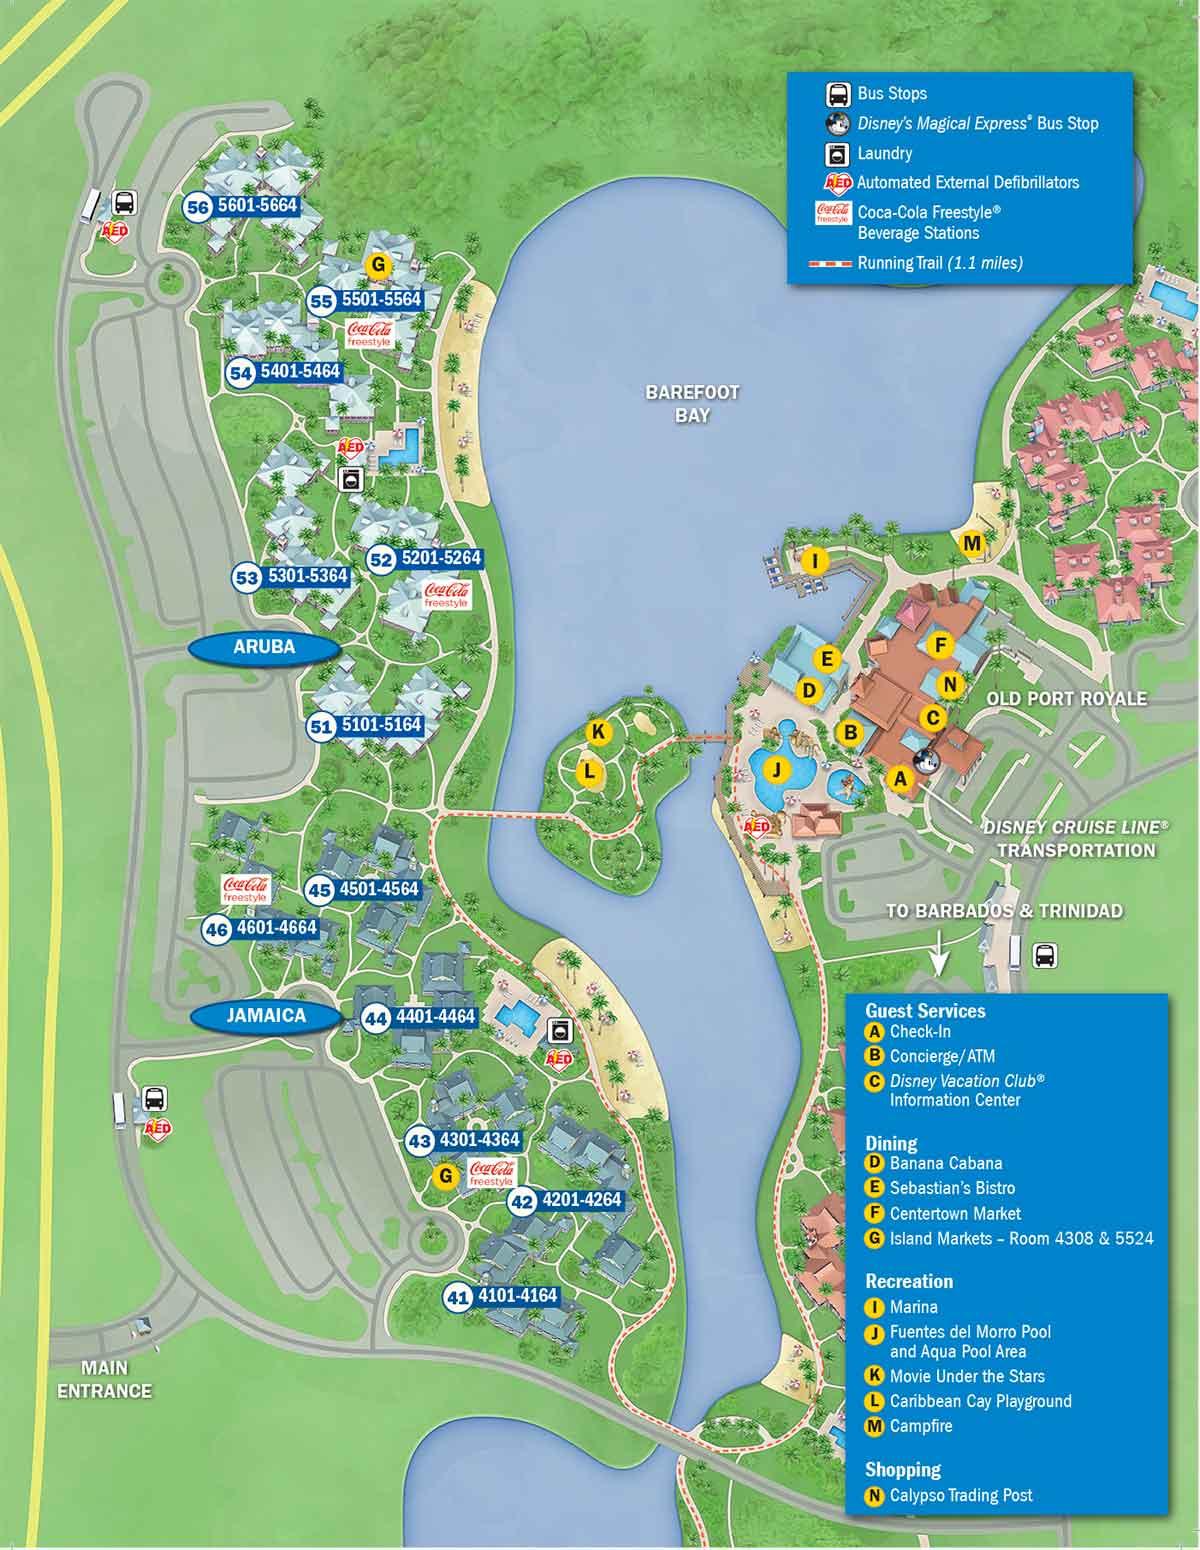 Disney's Caribbean Beach Resort Map - Wdwinfo - Florida Resorts Map